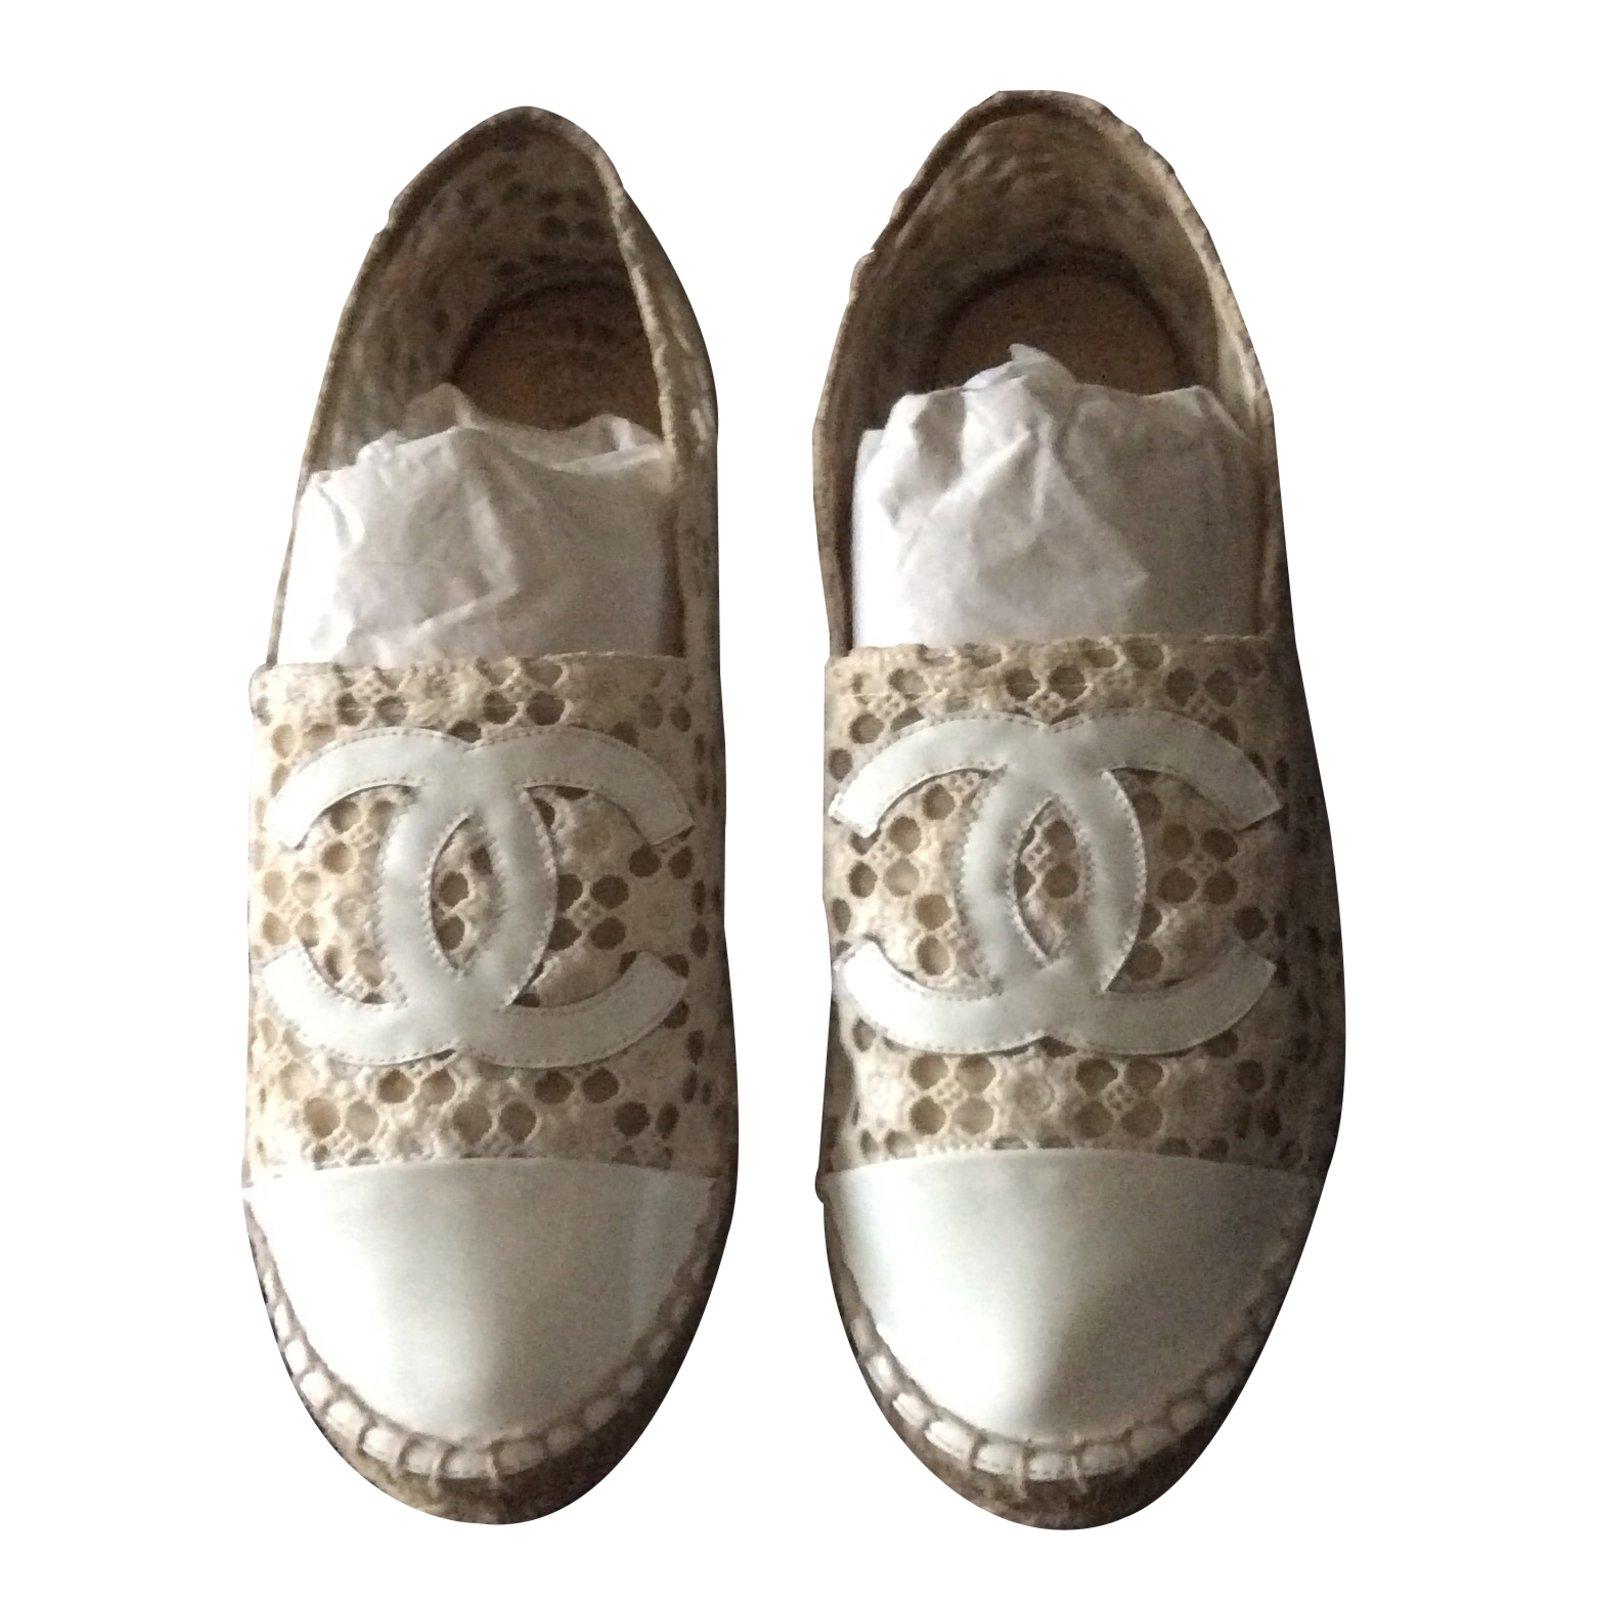 9e693226781 Chanel Canvas Espadrille Flat Shoes Sneakers White - Style Guru ...